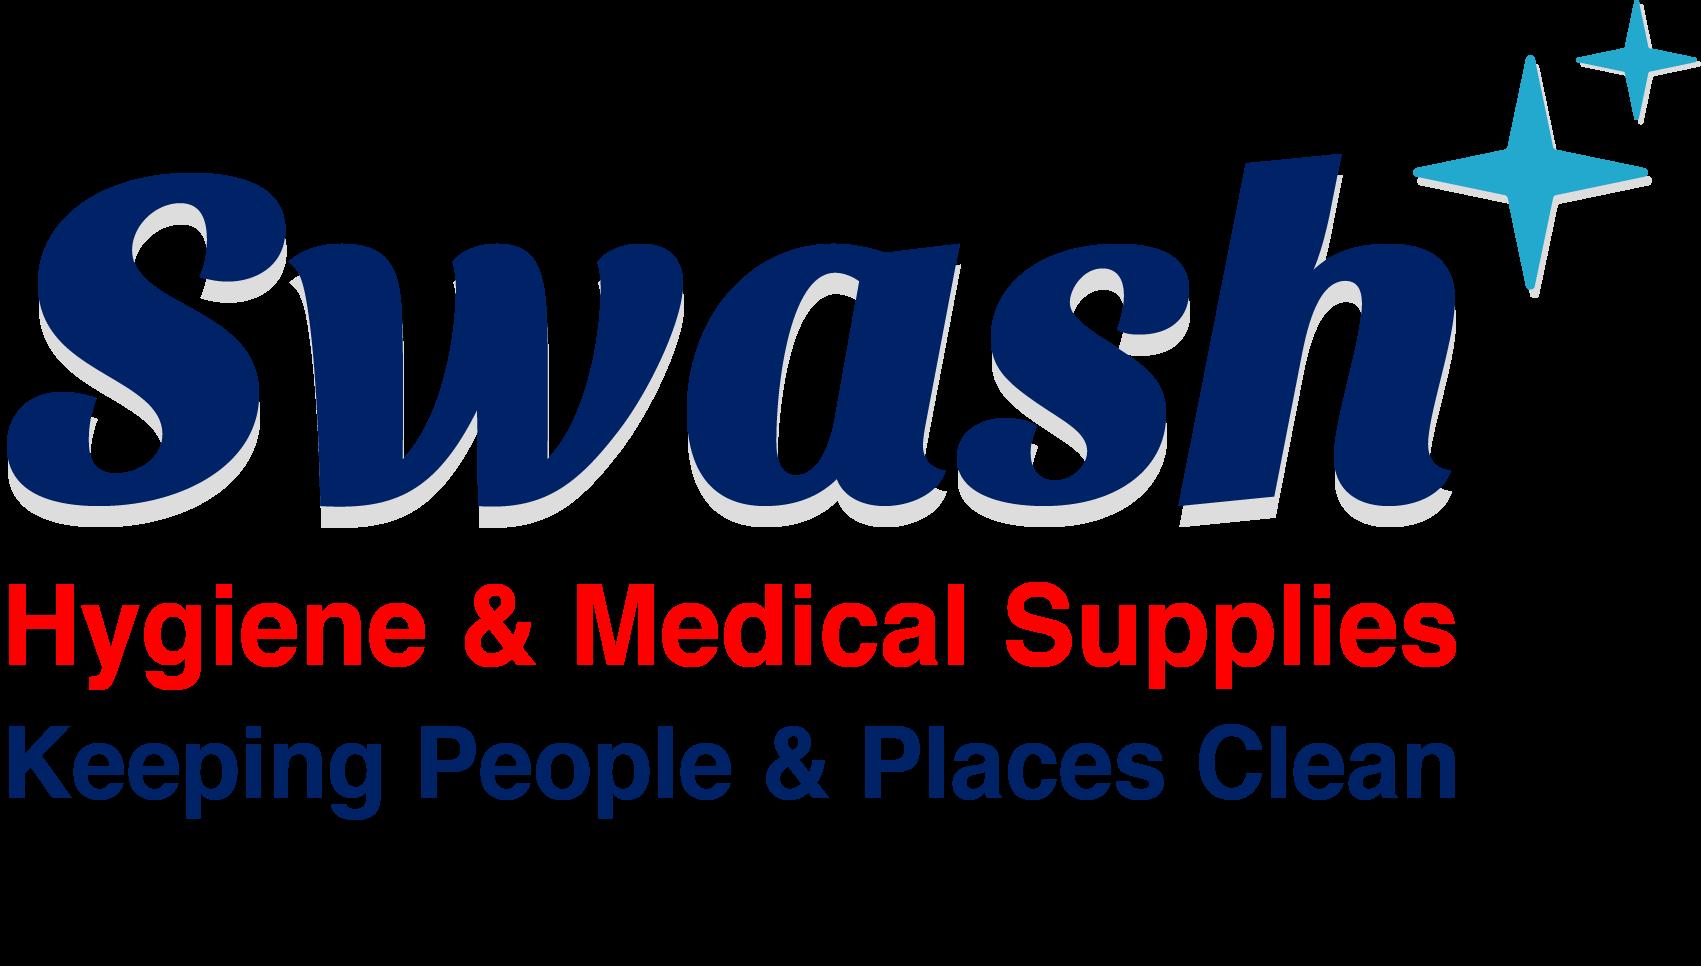 Swash Hygiene